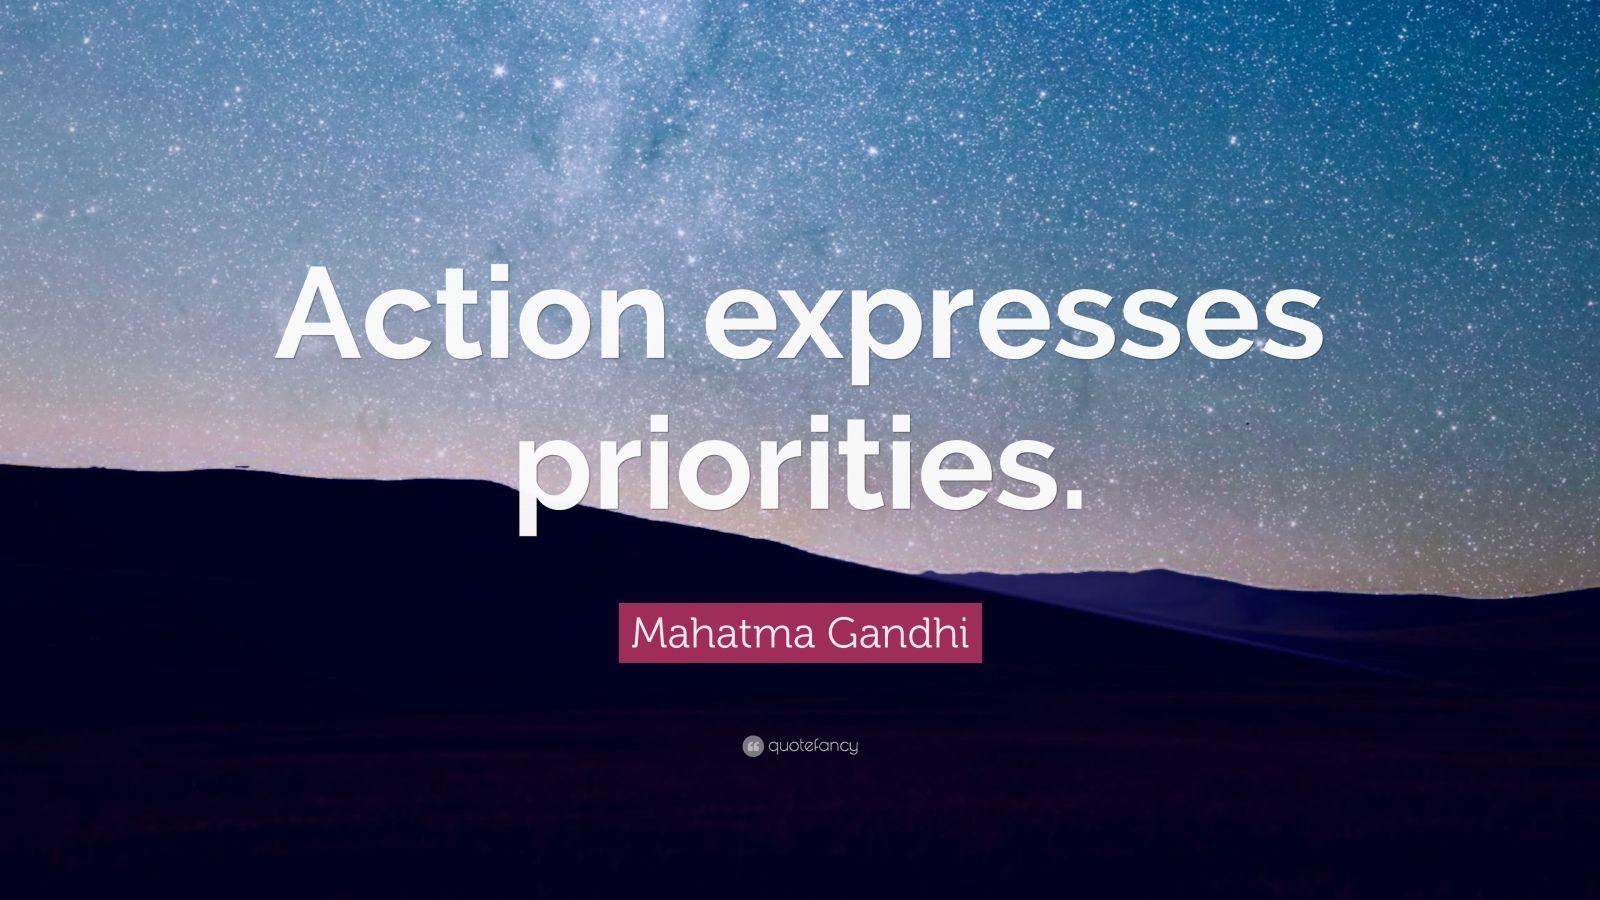 Mahatma Gandhi Wallpaper With Quotes Mahatma Gandhi Quote Action Expresses Priorities 17